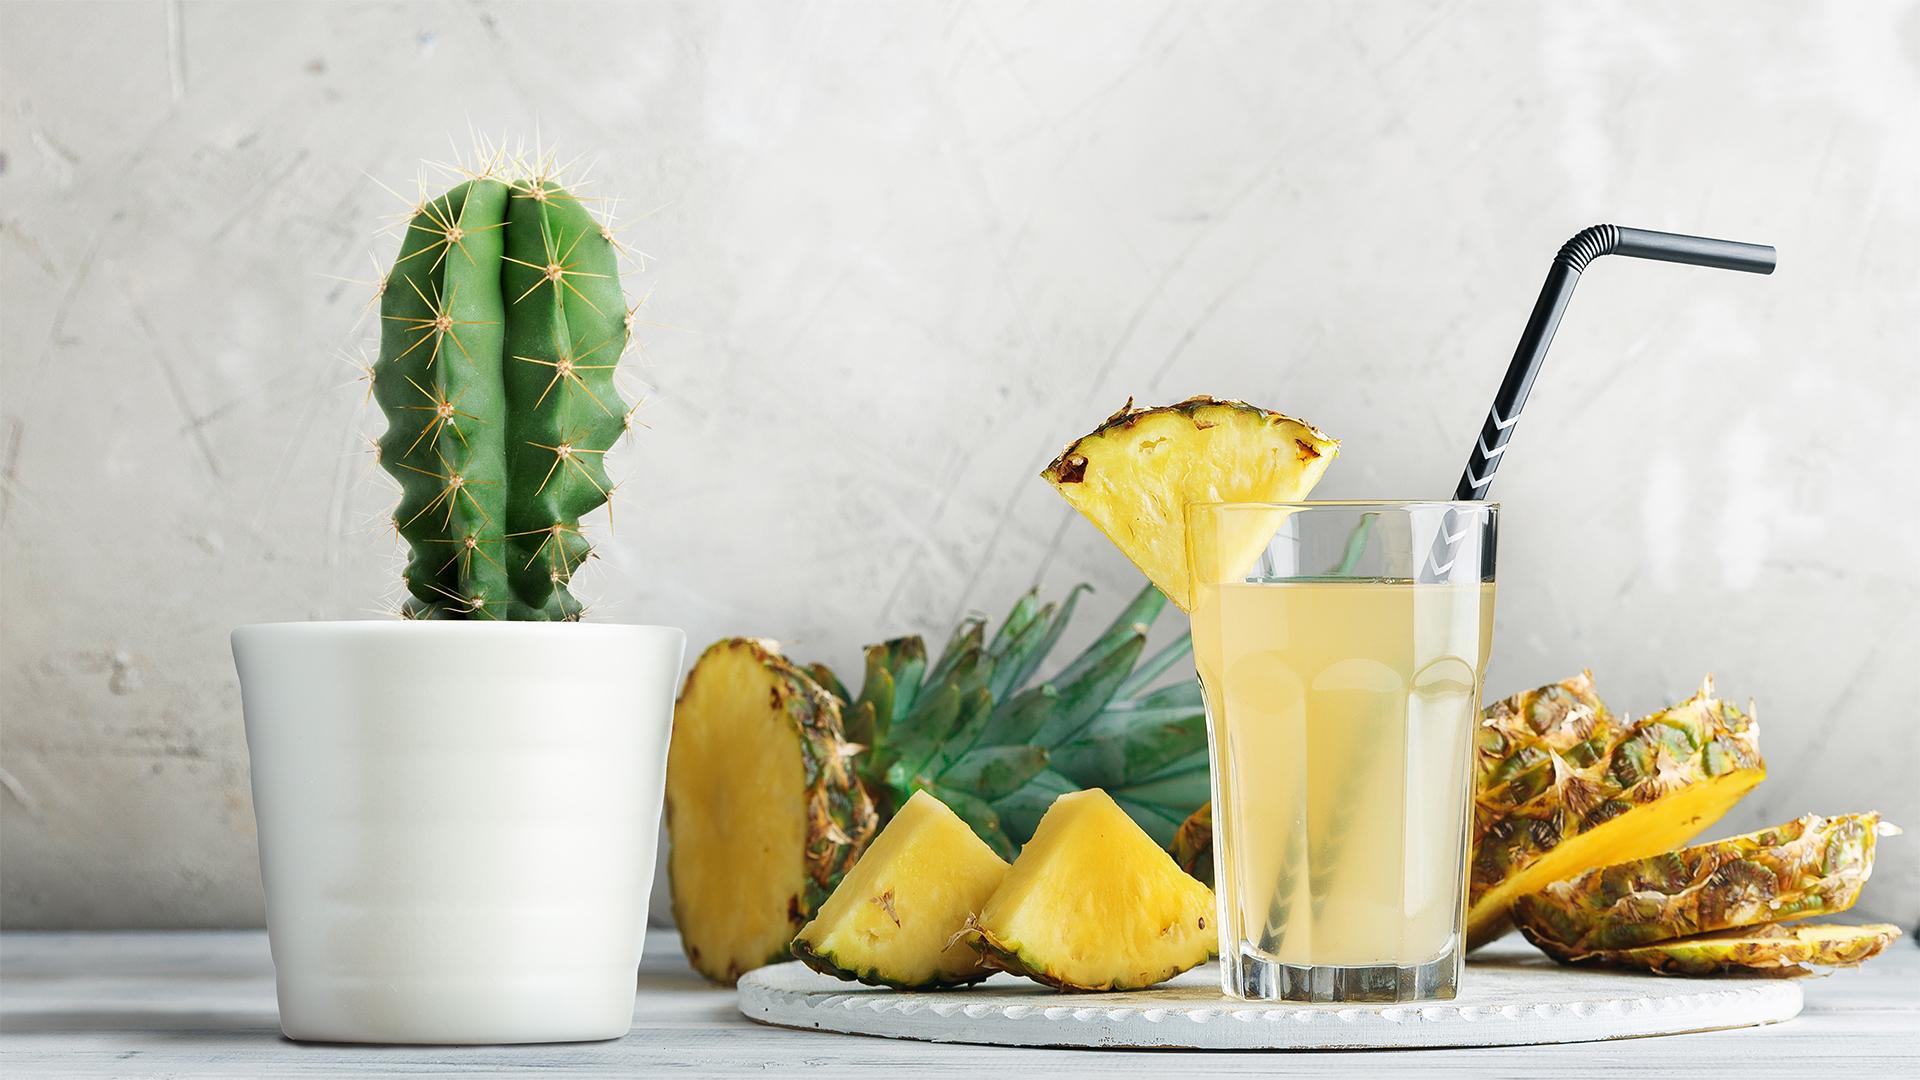 Flowertown pineapple sativa cannabis